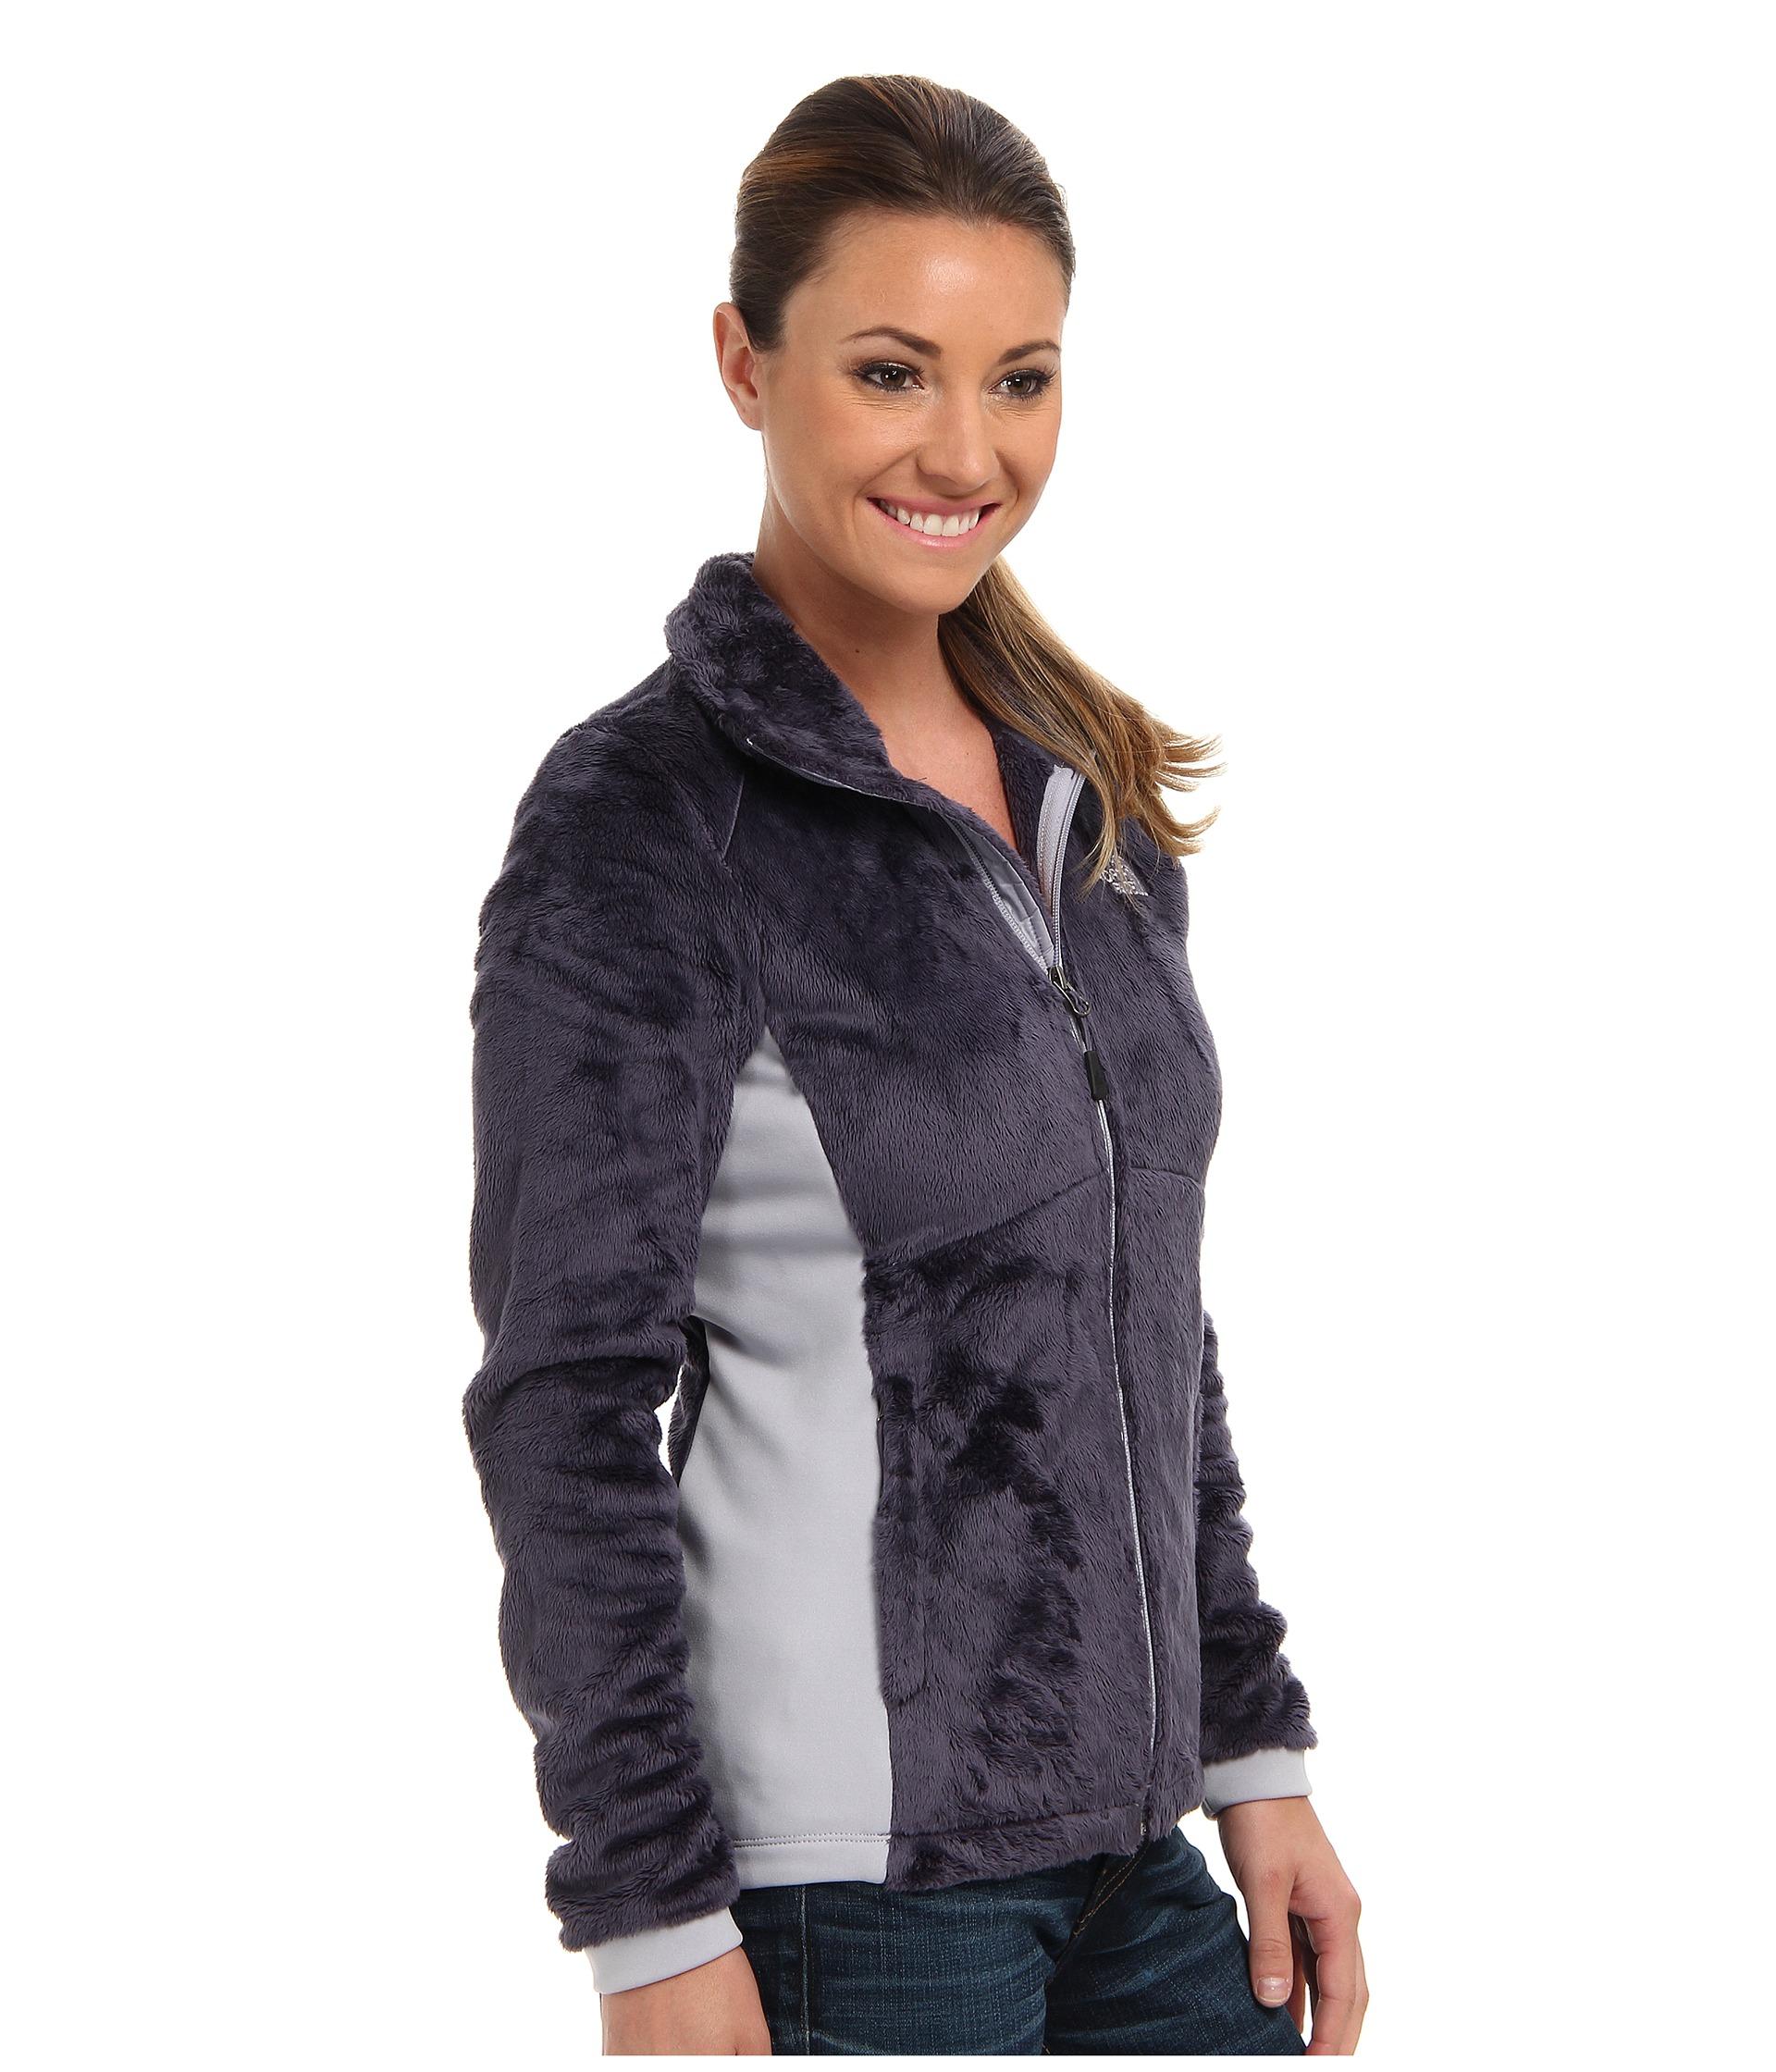 de37efd7b purchase the north face tech osito fleece jacket womens 0dd36 0be2c